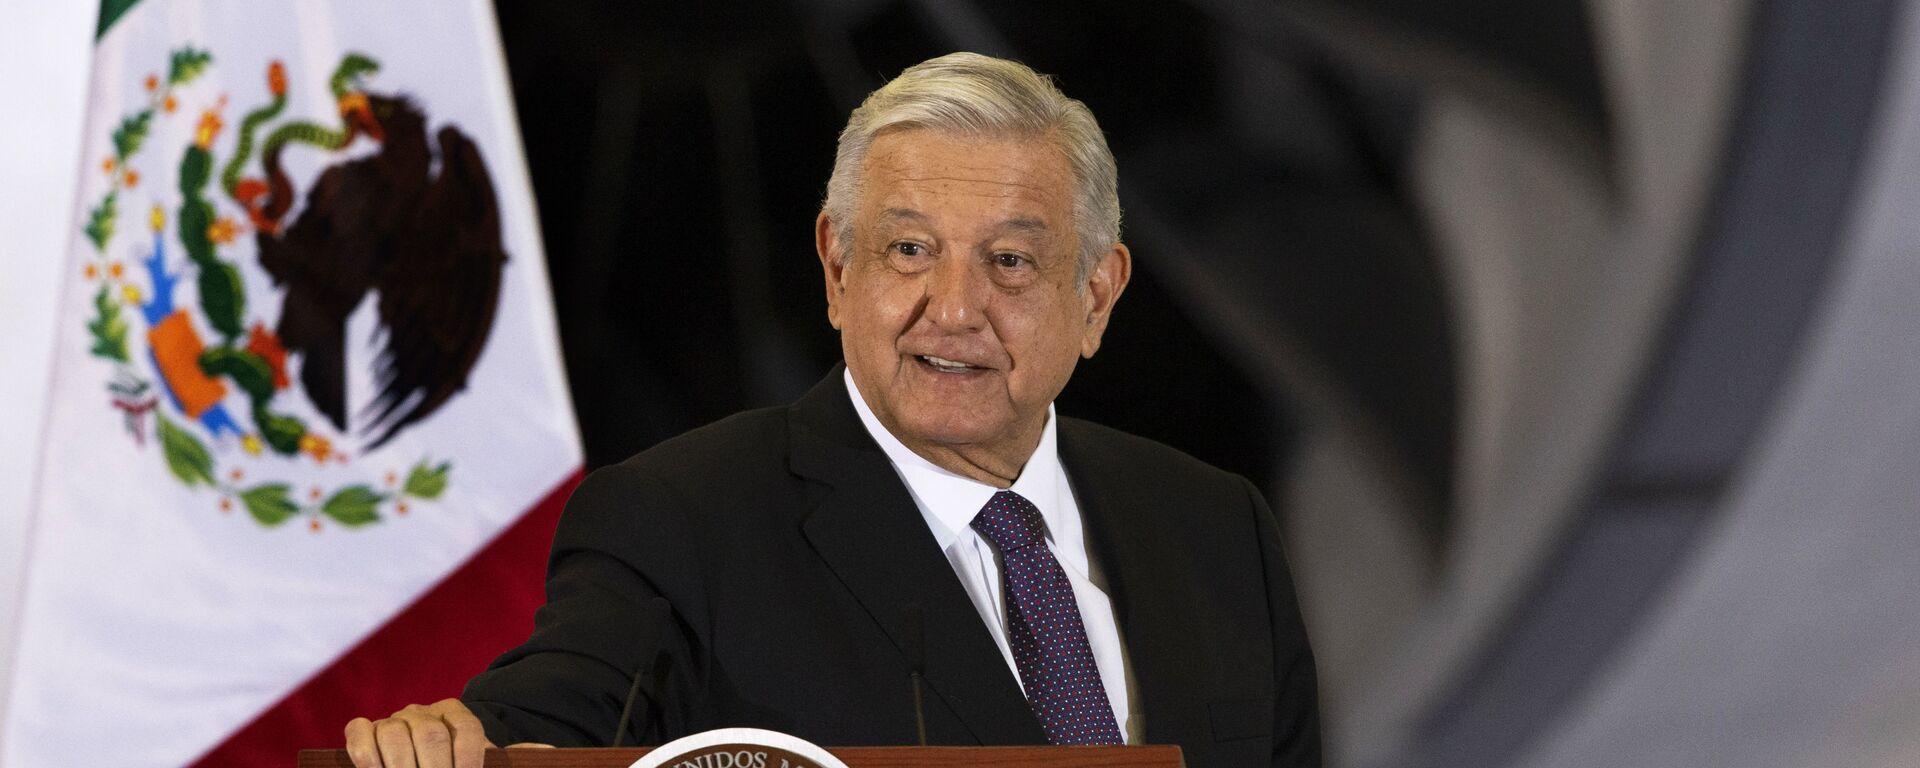 El presidente de México, Andrés Manuel López Obrador - Sputnik Mundo, 1920, 13.01.2021